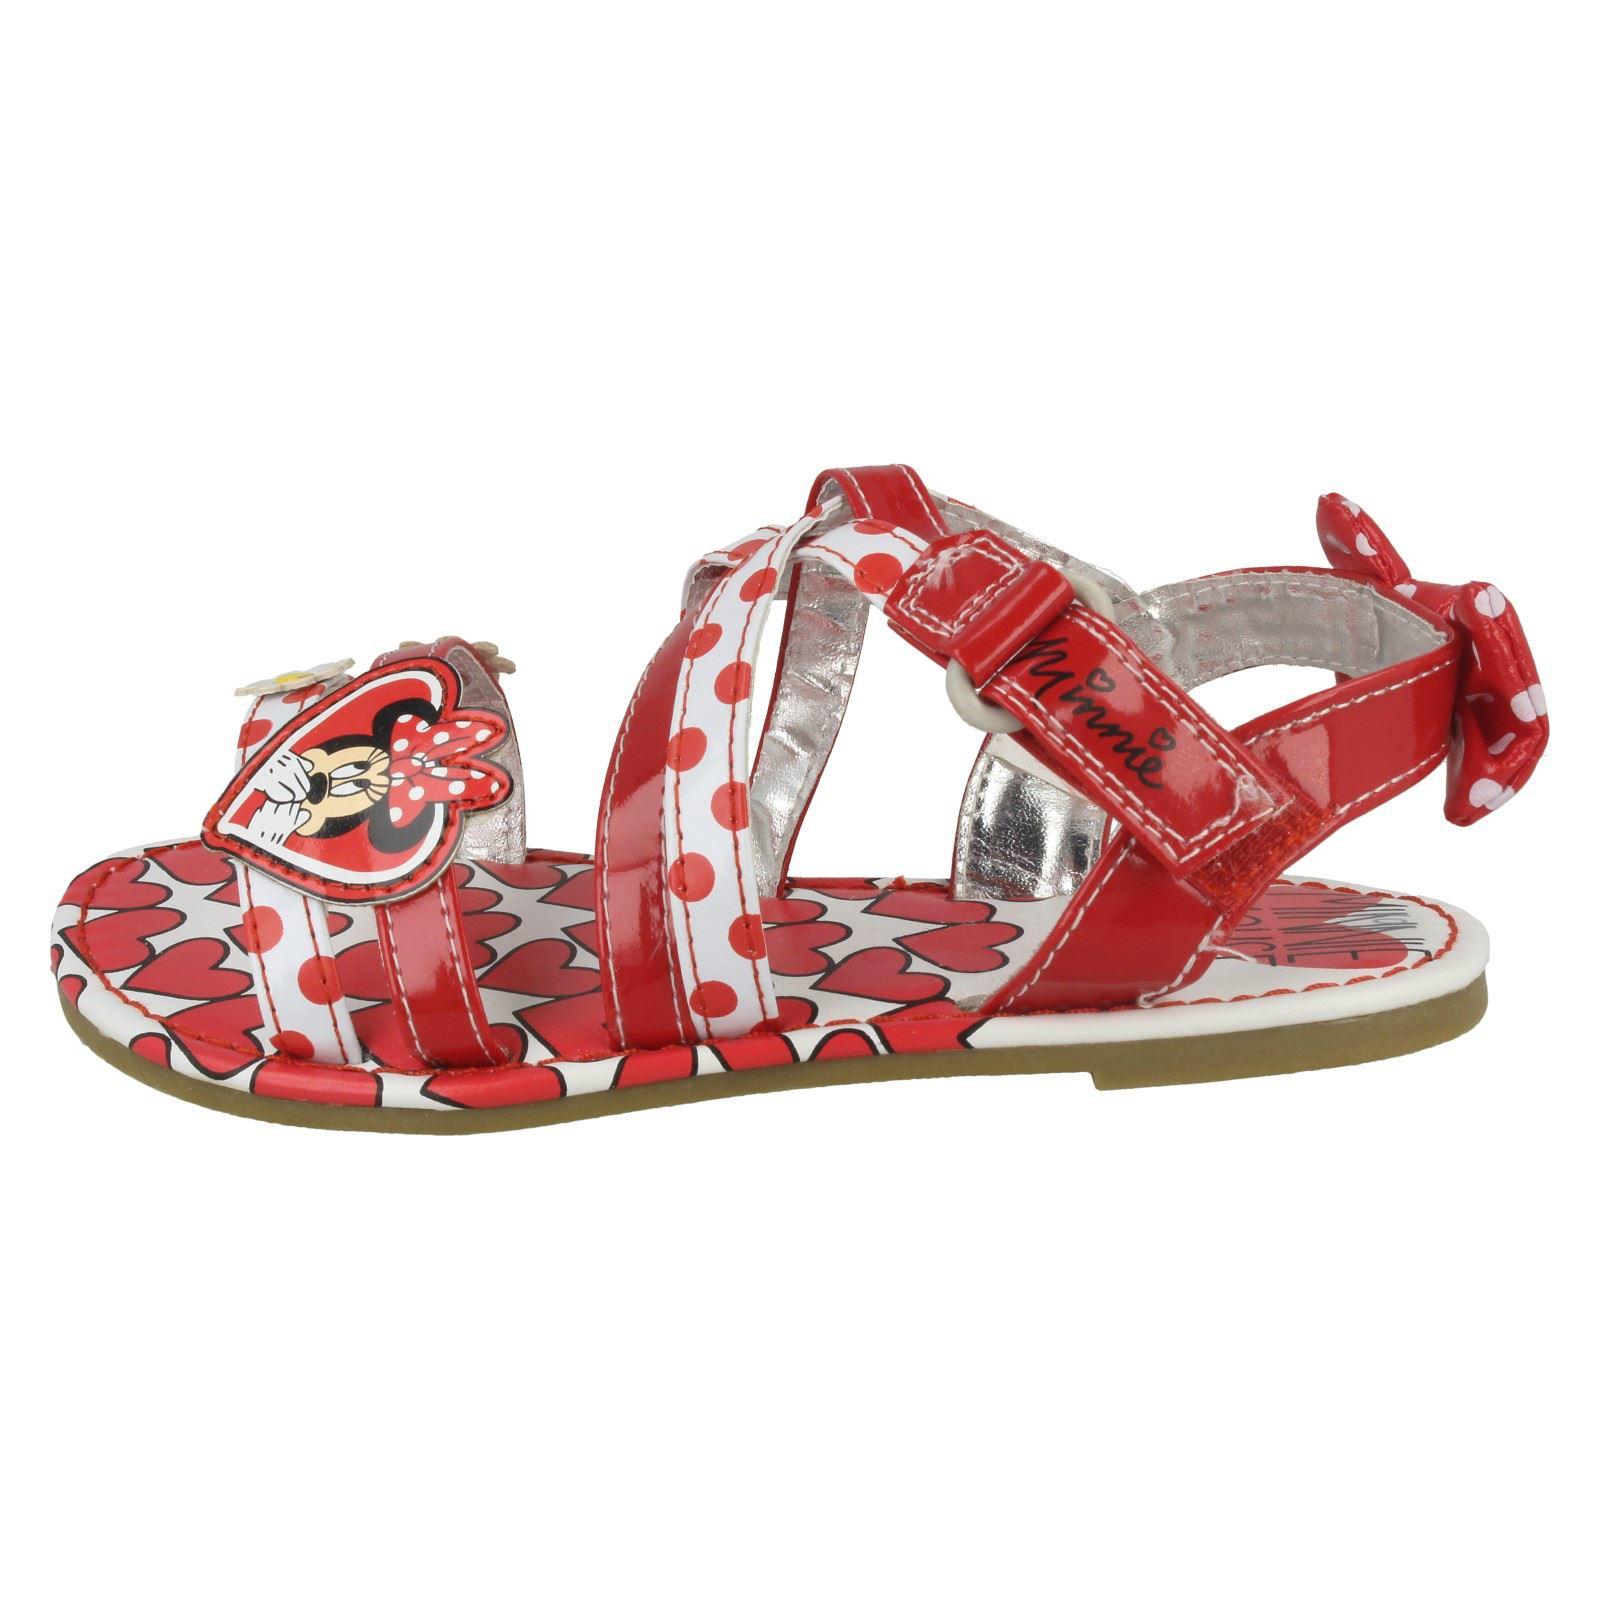 Girls Disney Casual Ankle Strap Sandals /'Minnie Mouse Emilia/'